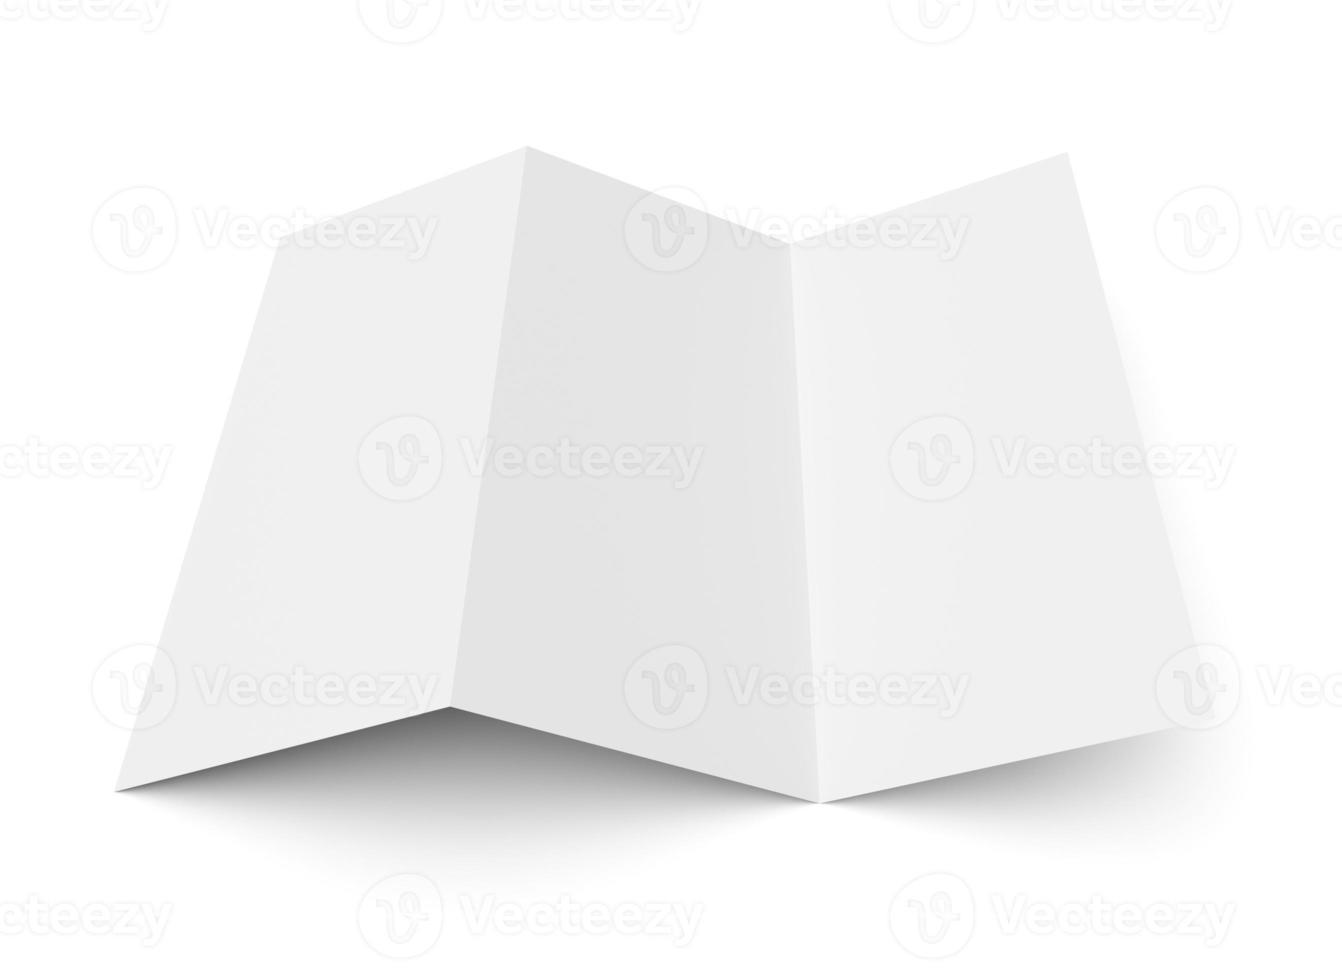 Leaflet blank z-fold white paper brochure photo